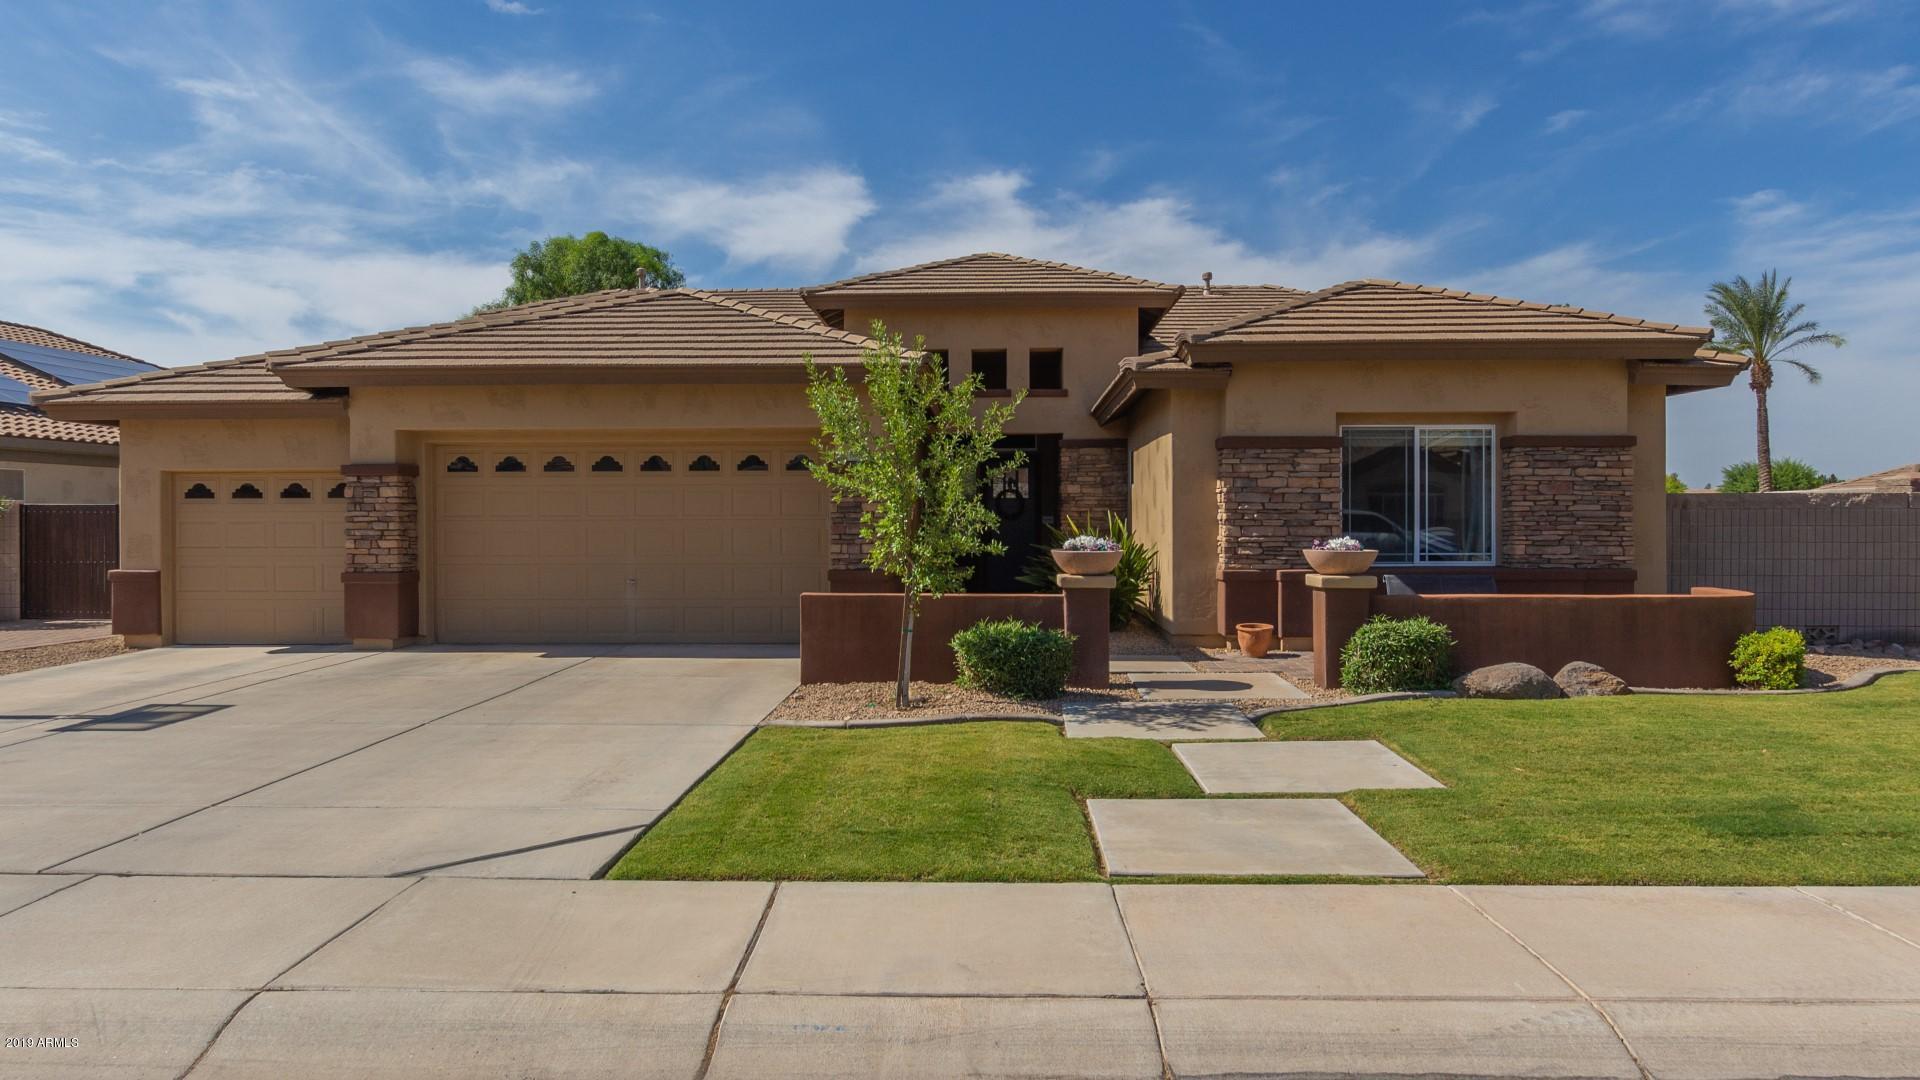 8621 W MOHAWK Lane, Peoria in Maricopa County, AZ 85382 Home for Sale